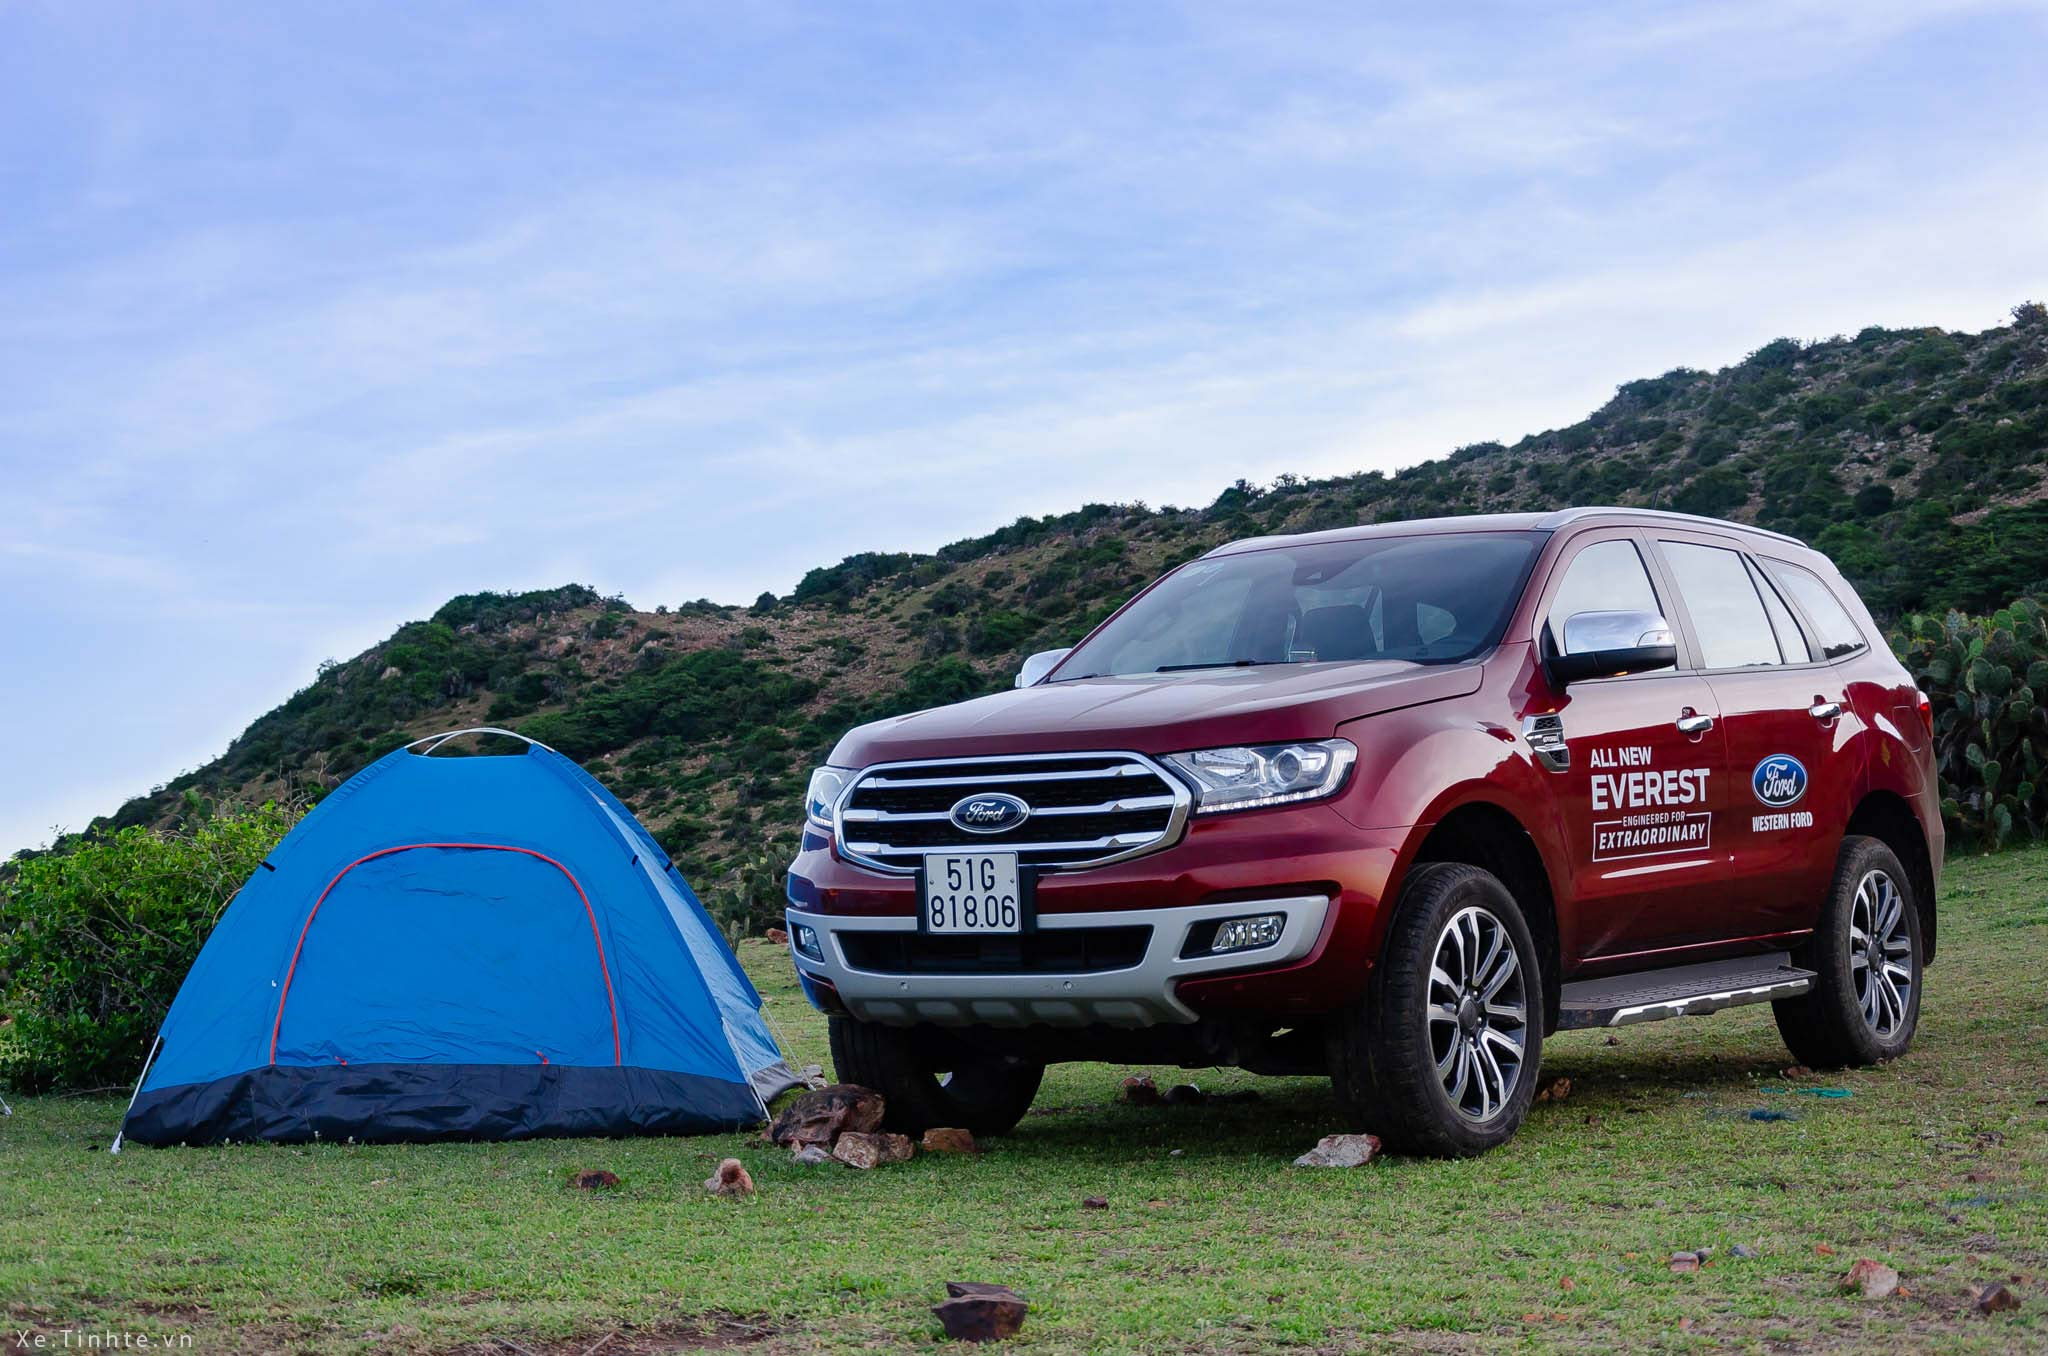 Ford_Everest_2018_Xe_Tinhte-(5).jpg